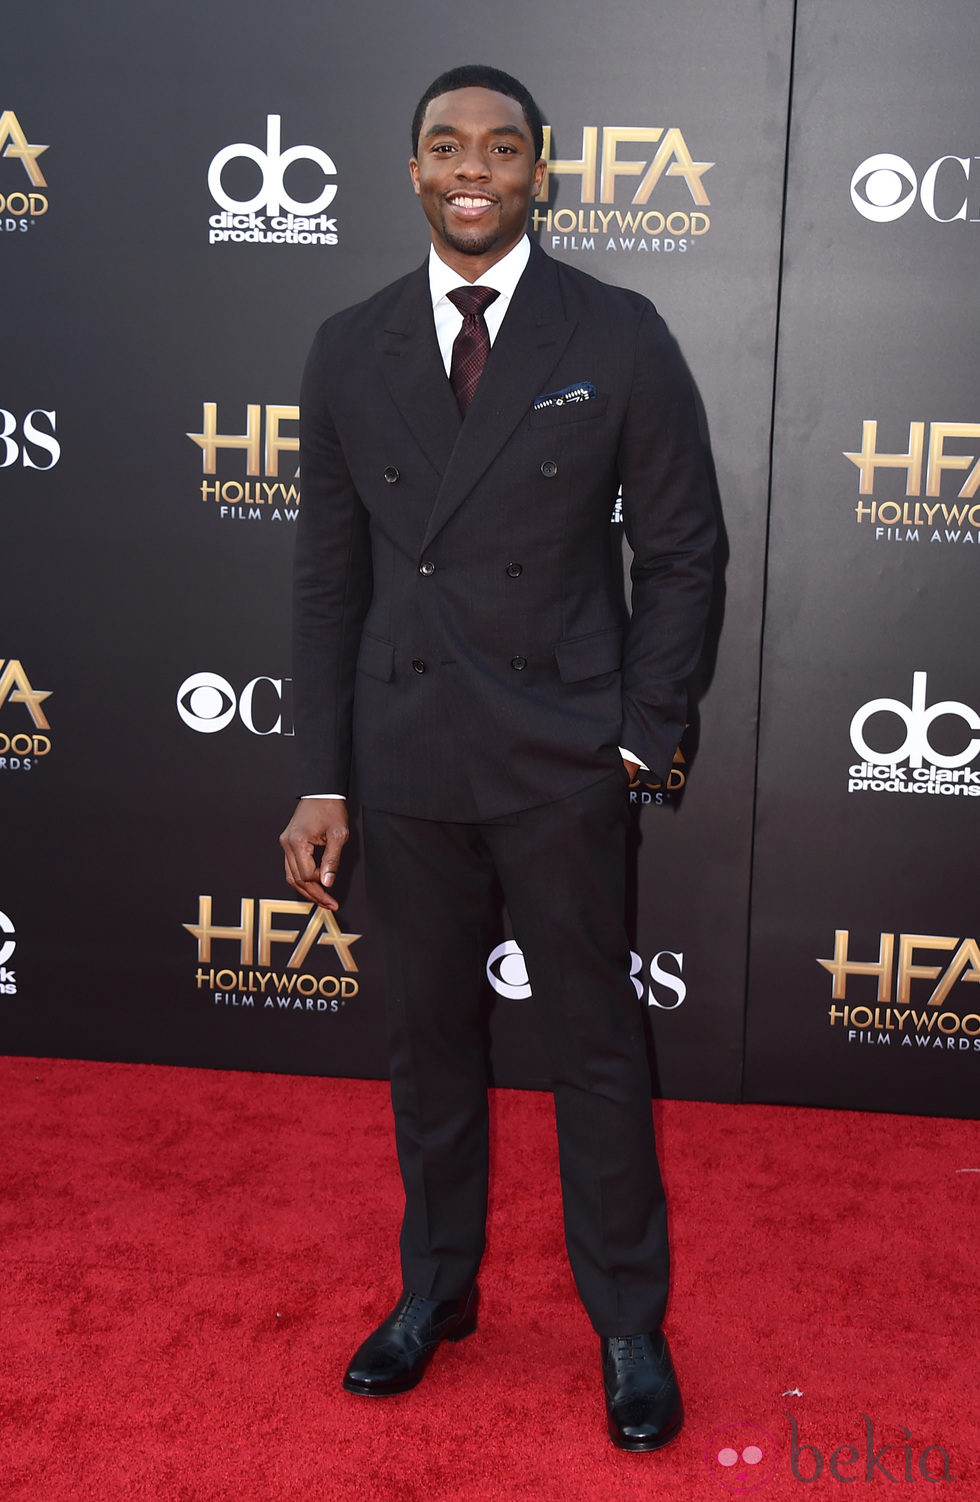 Chadwick Boseman en los Hollywood Film Awards 2014